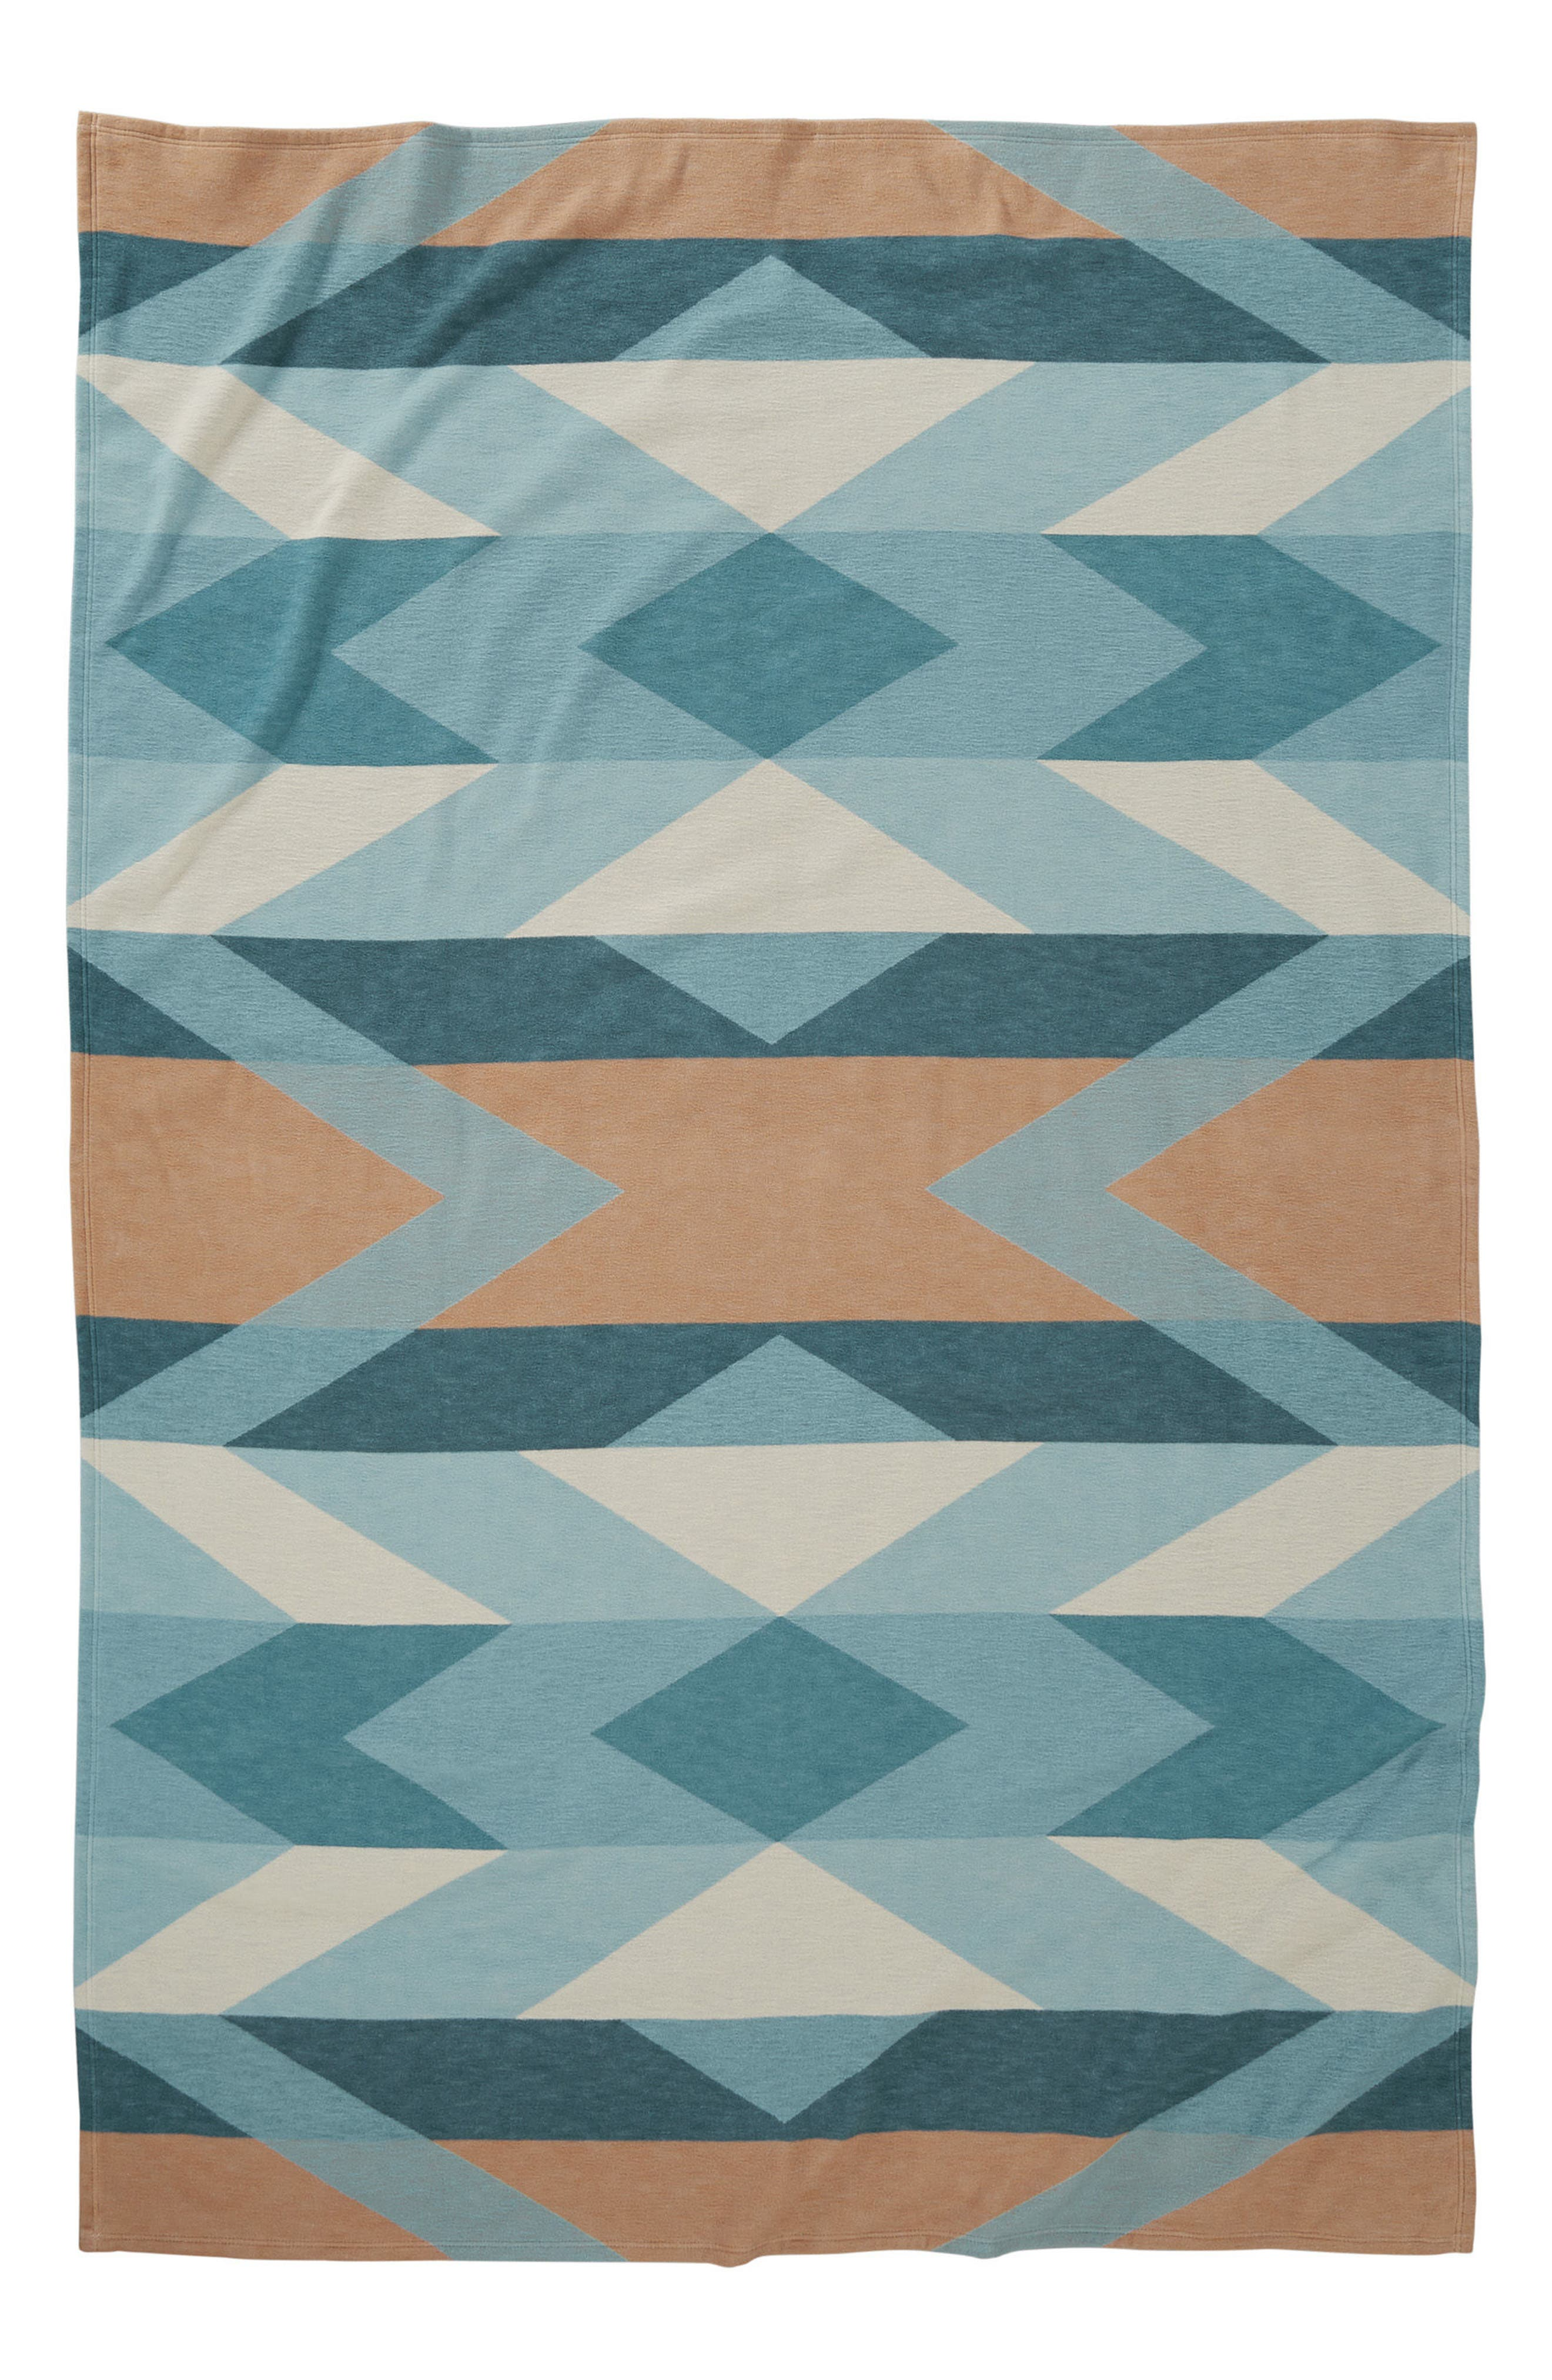 Pima Canyon Throw Blanket,                         Main,                         color, 400